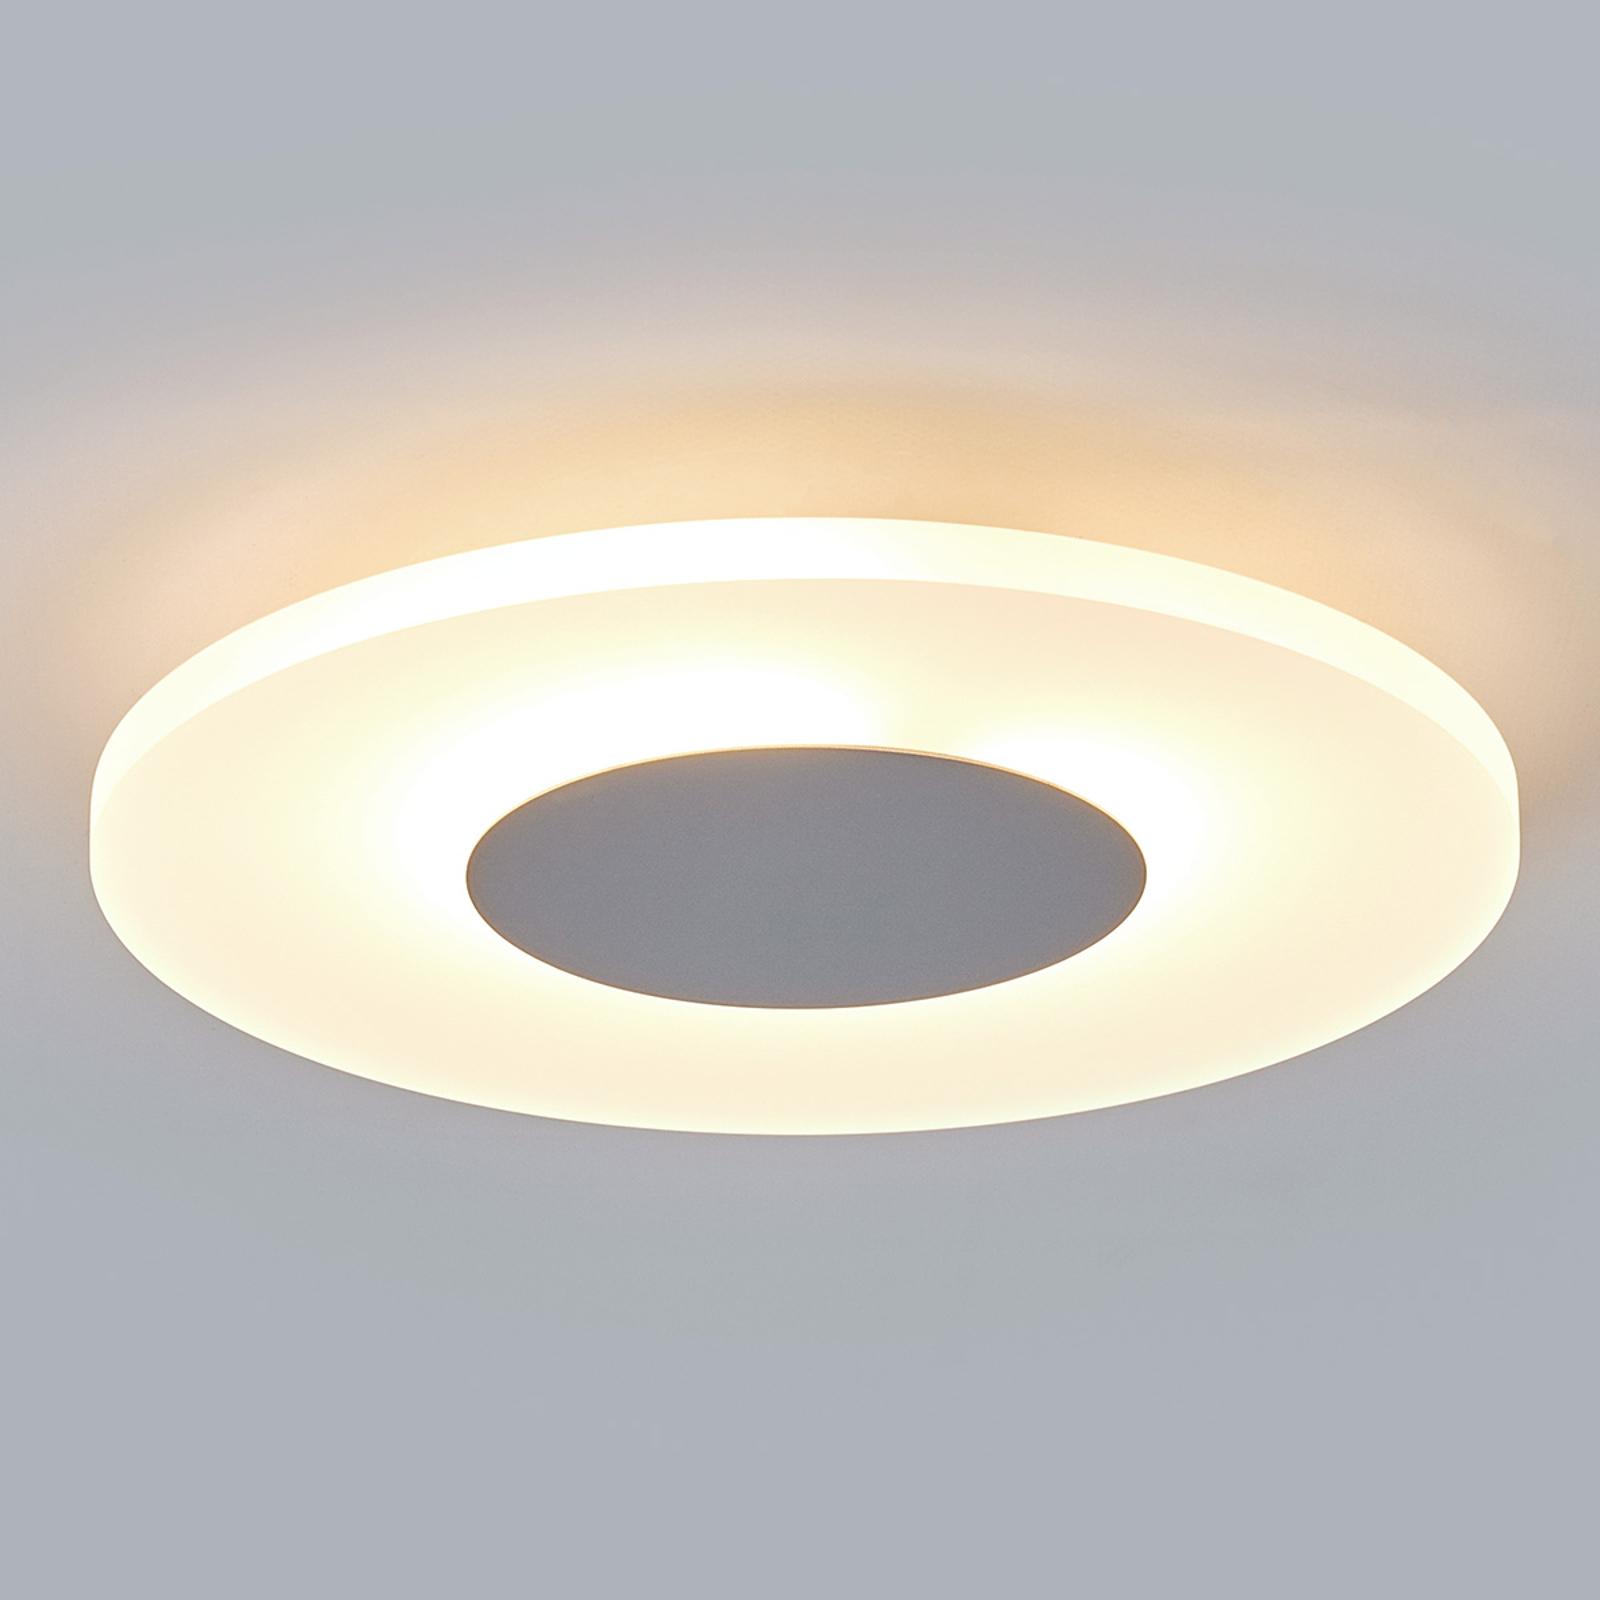 Plafonnier décoratif LED Tarja